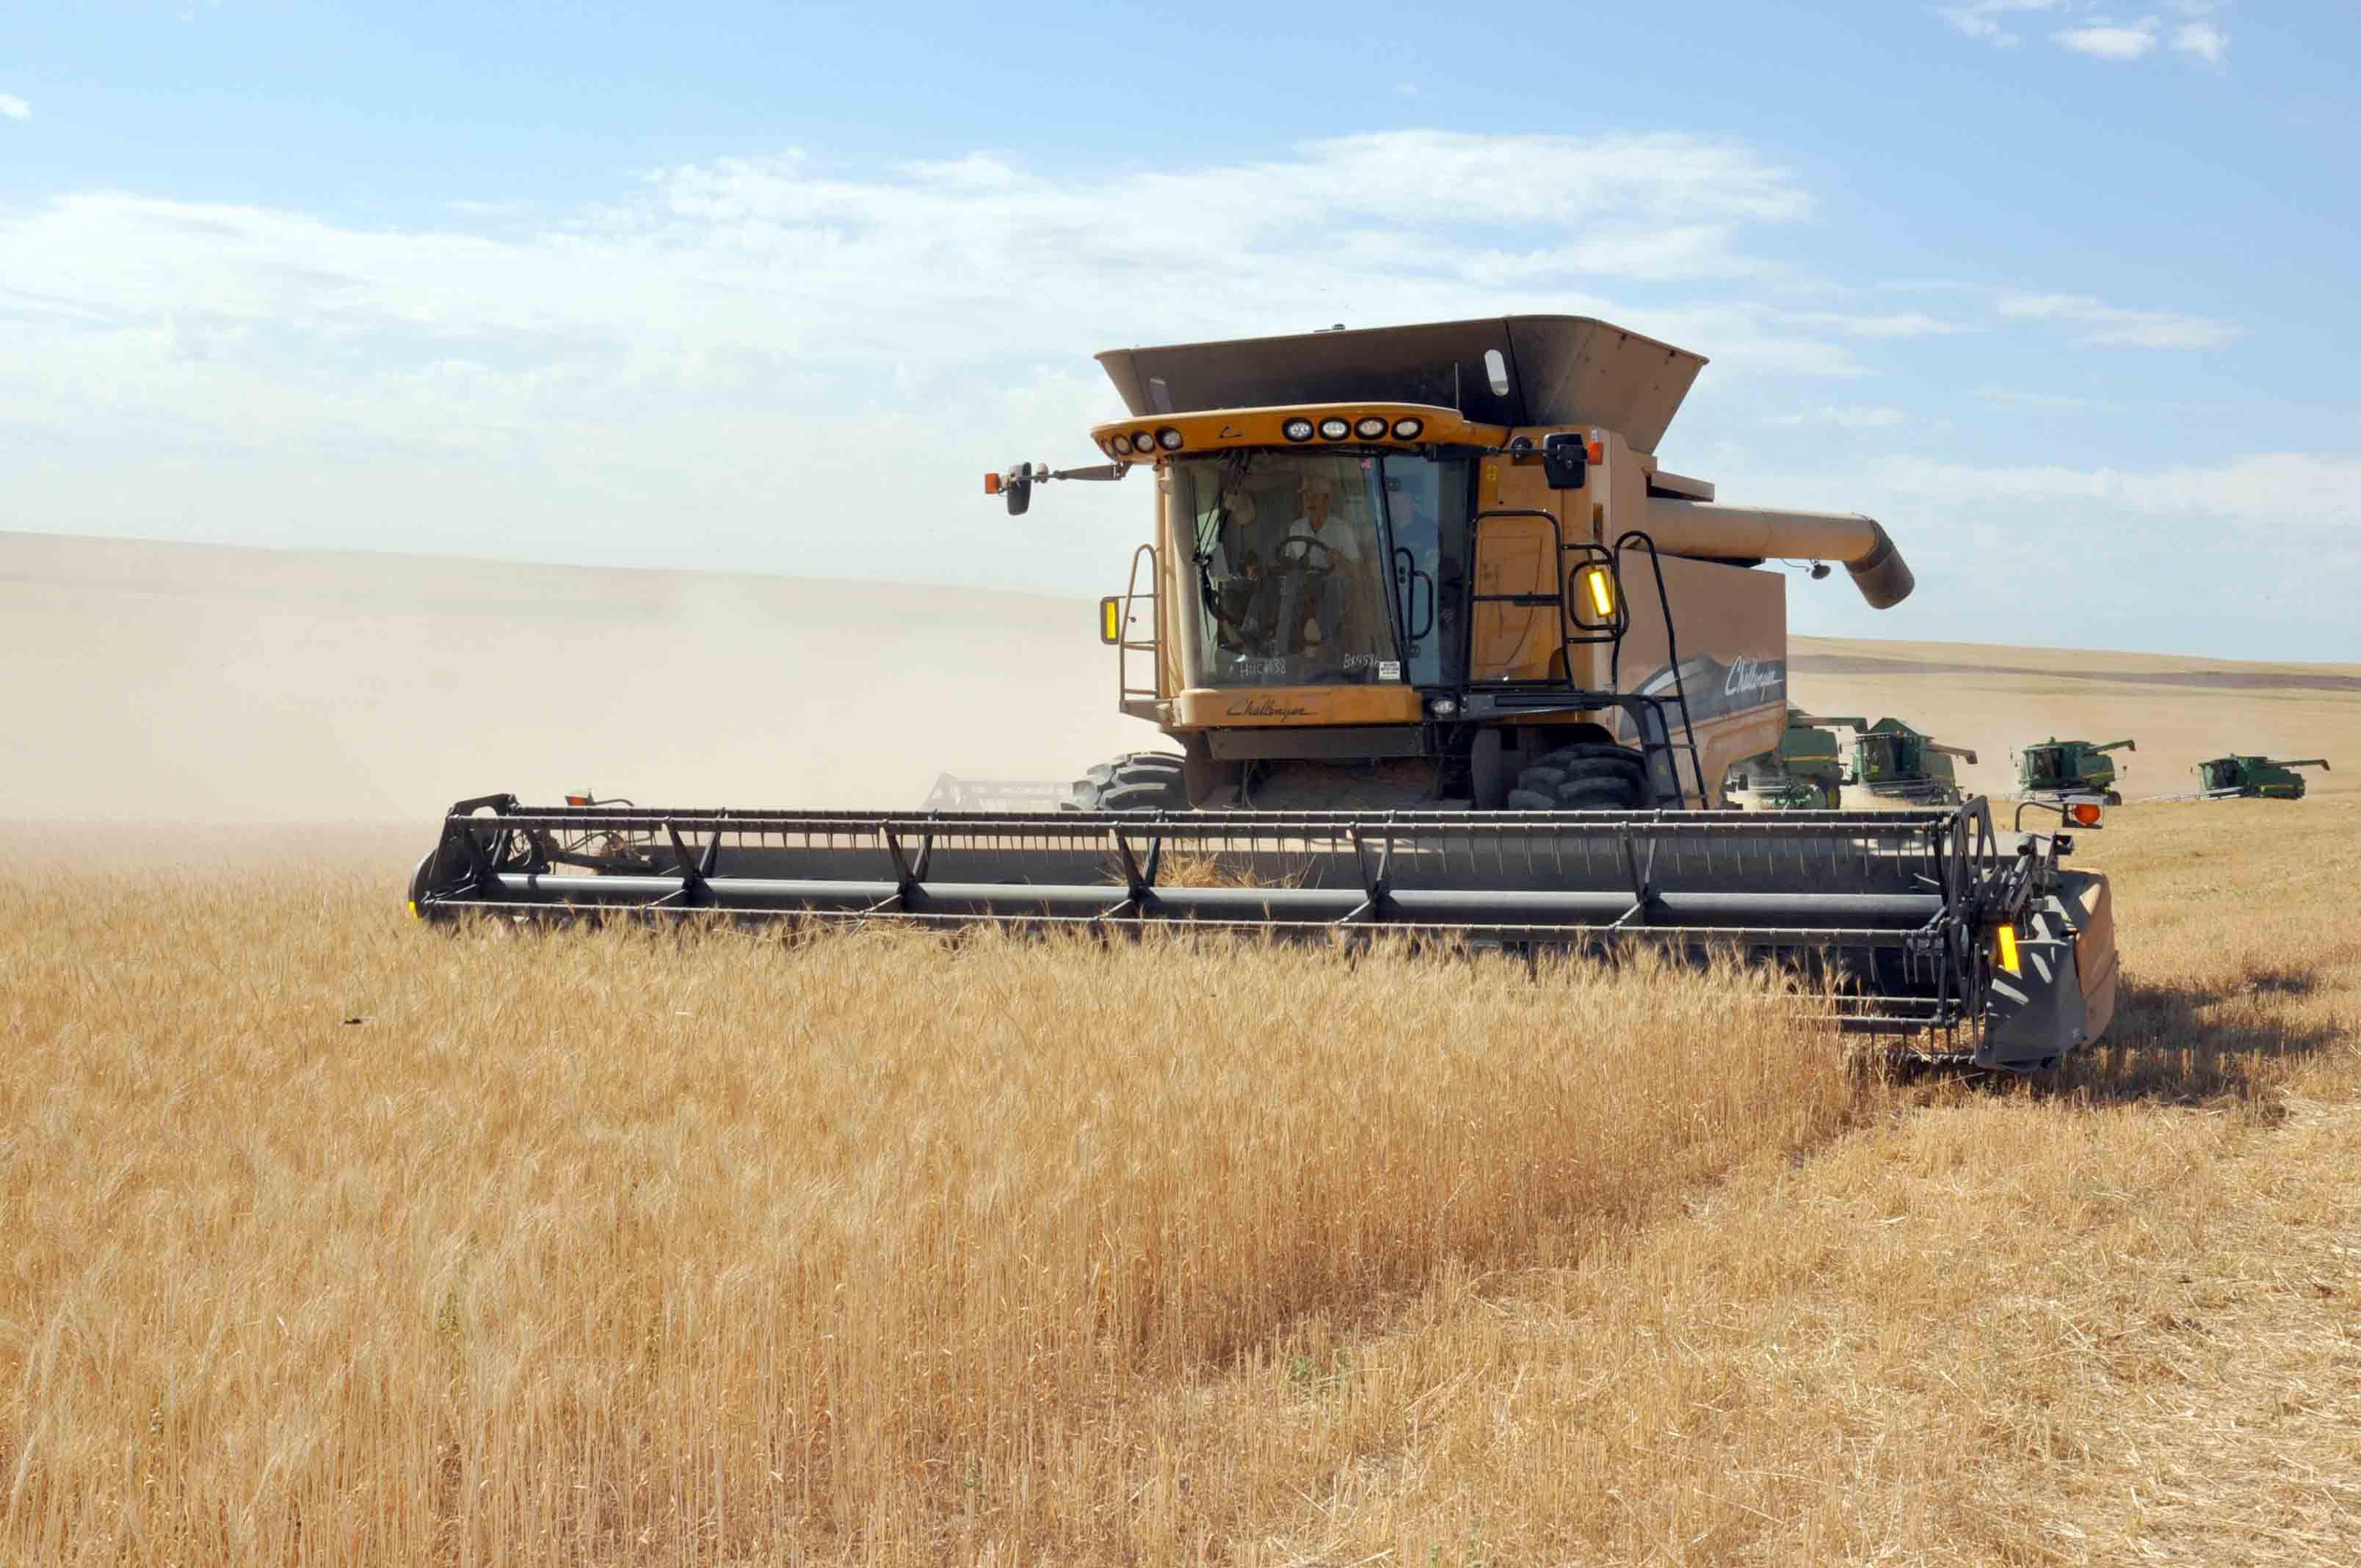 уборка пшеницы комбайнами картинки магазины элитные